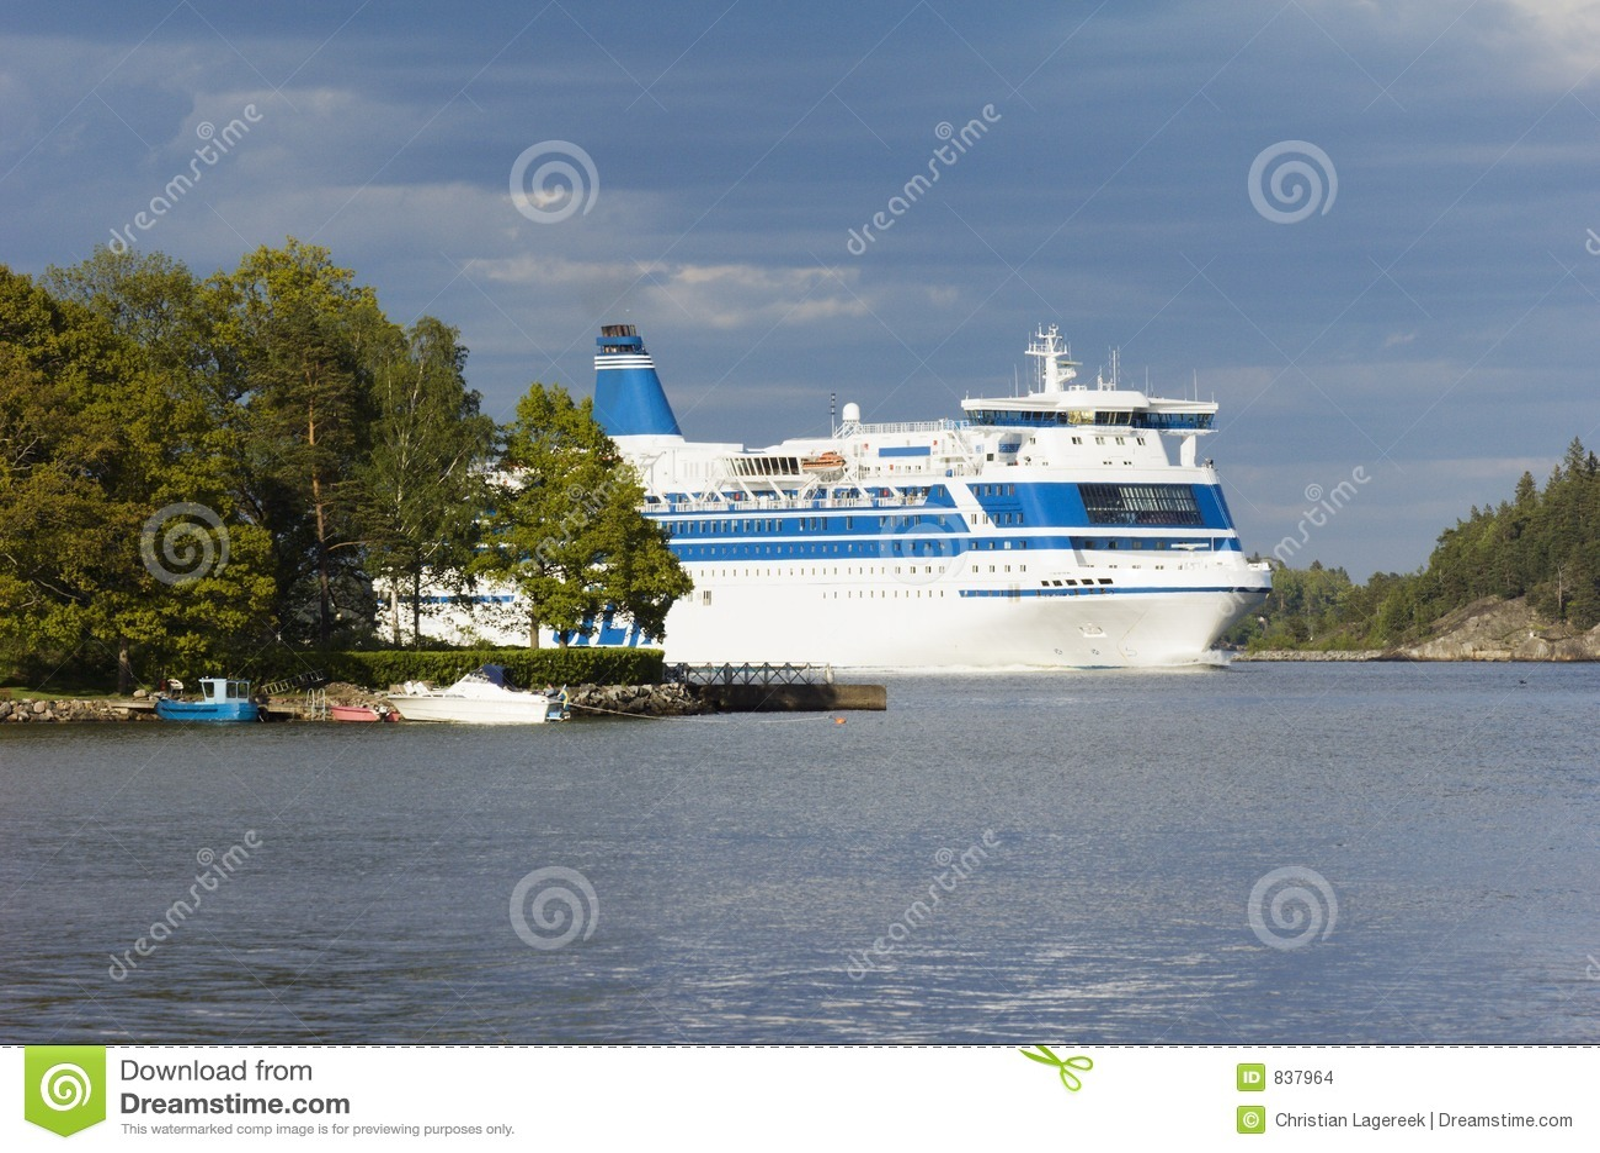 Cruise-ship between islands